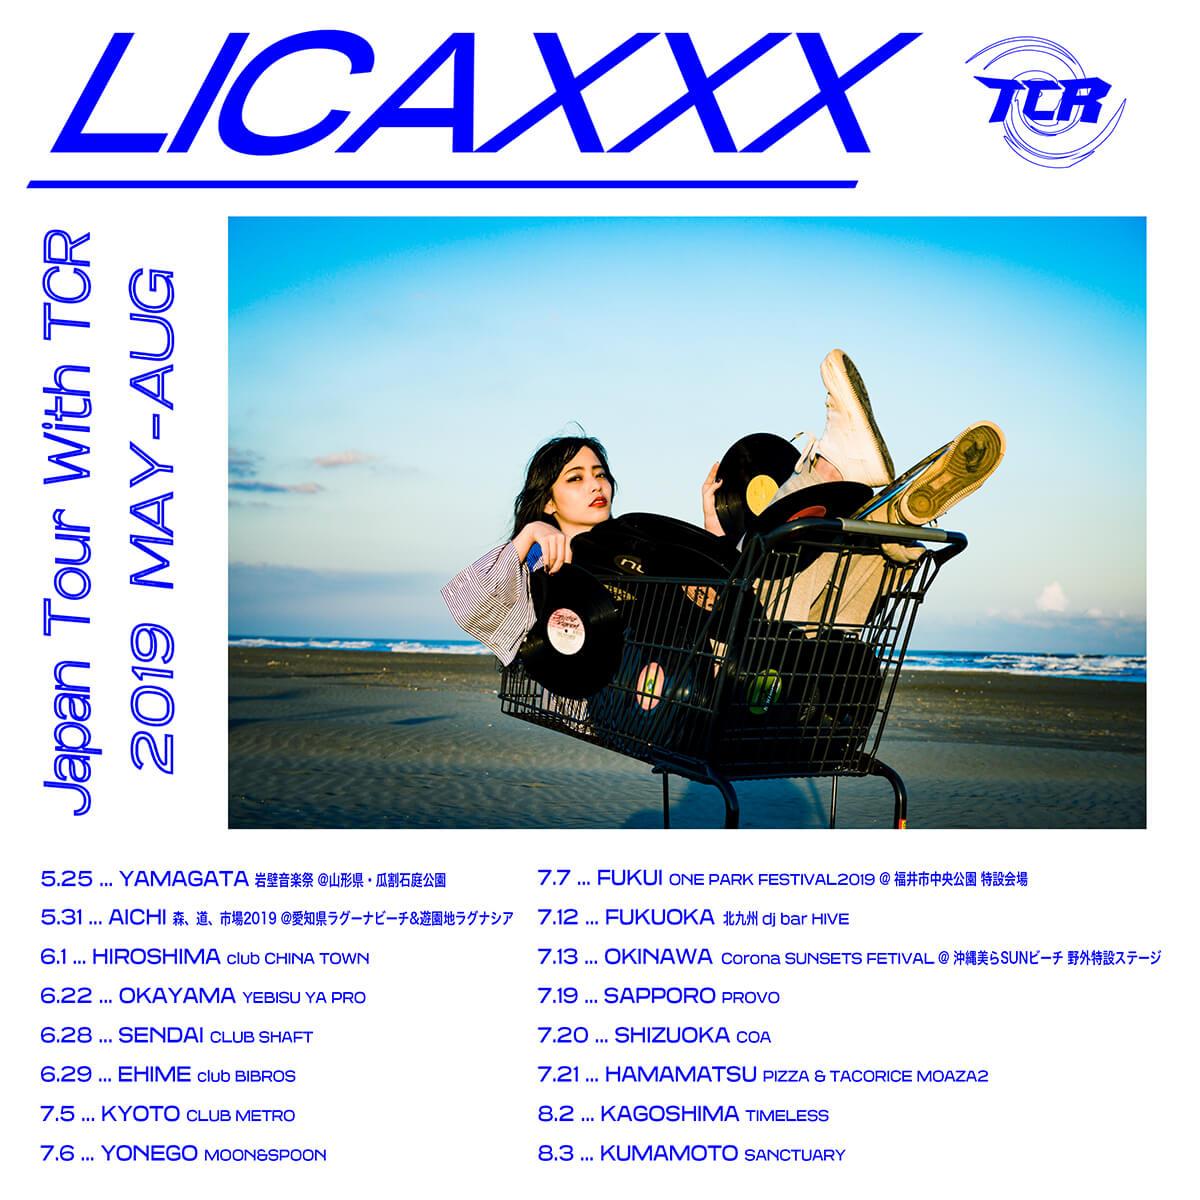 Licaxxxが主宰する「Tokyo Community Radio」のローンチを記念し、全国DJツアーが開催 music190510-licaxxx-2